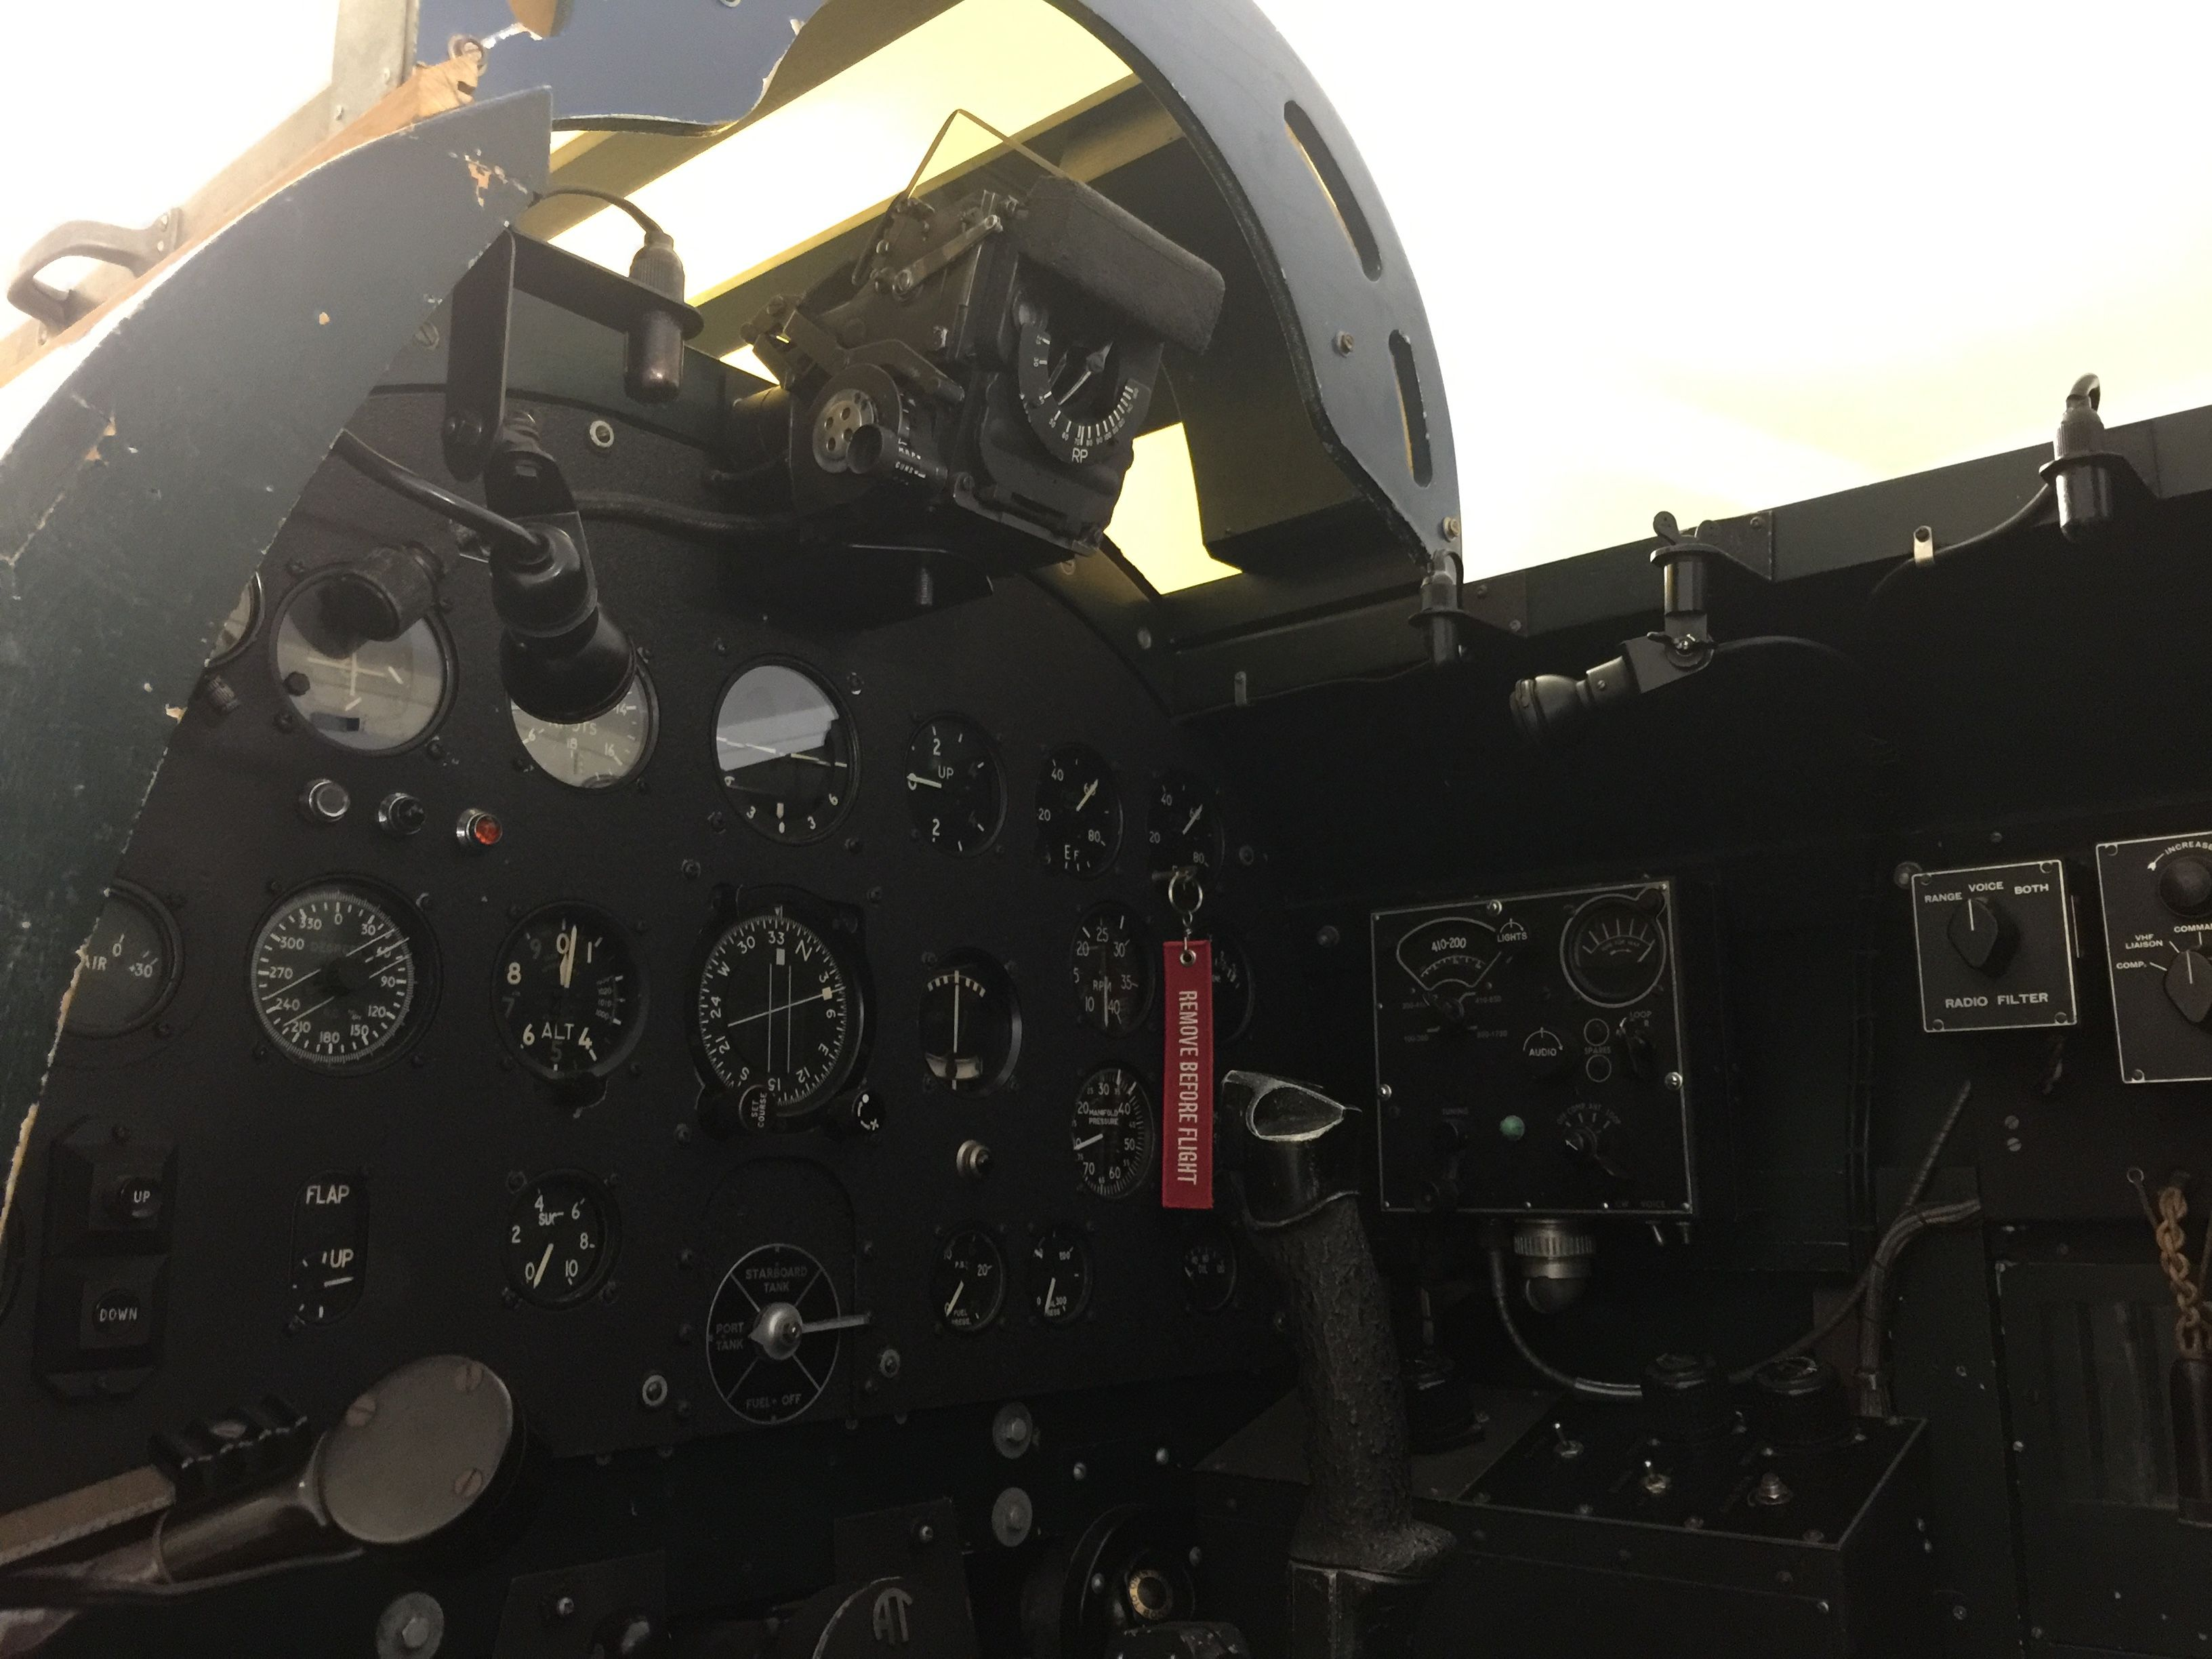 Pin by Junkandjeeps on Boiler Gauge Aircraft instruments